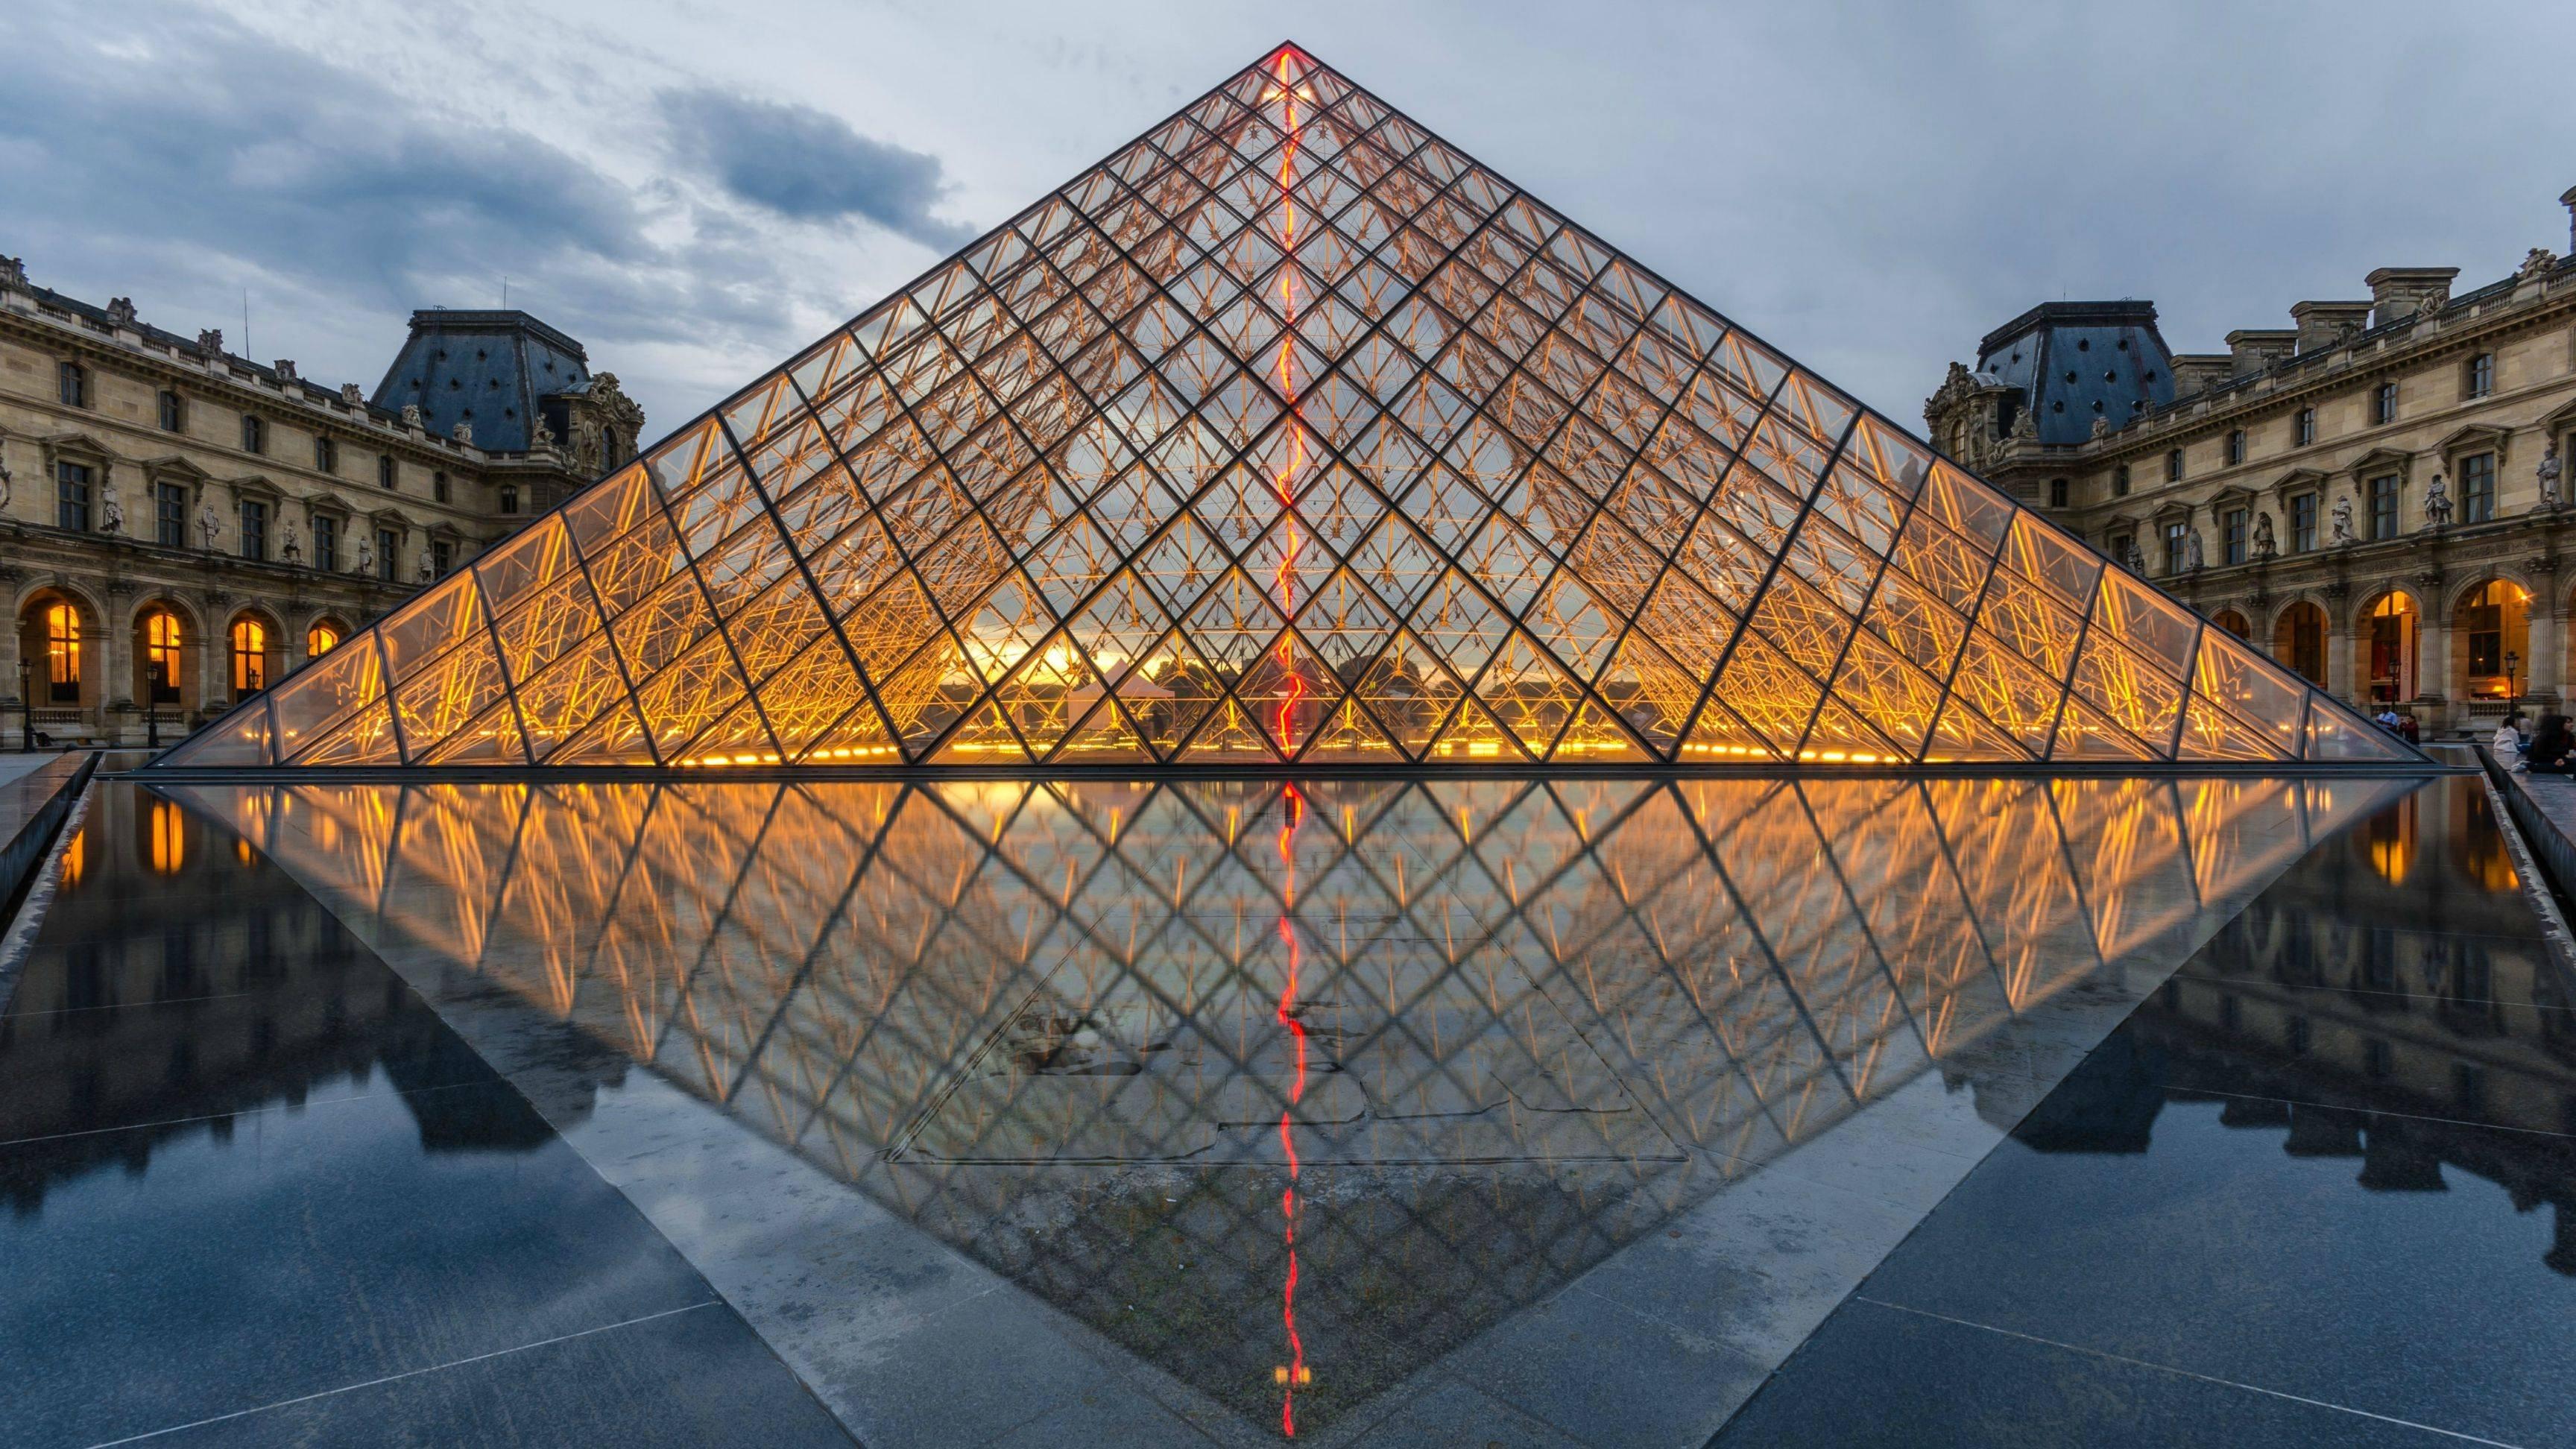 Louvre Pyramid Hd Wallpaper